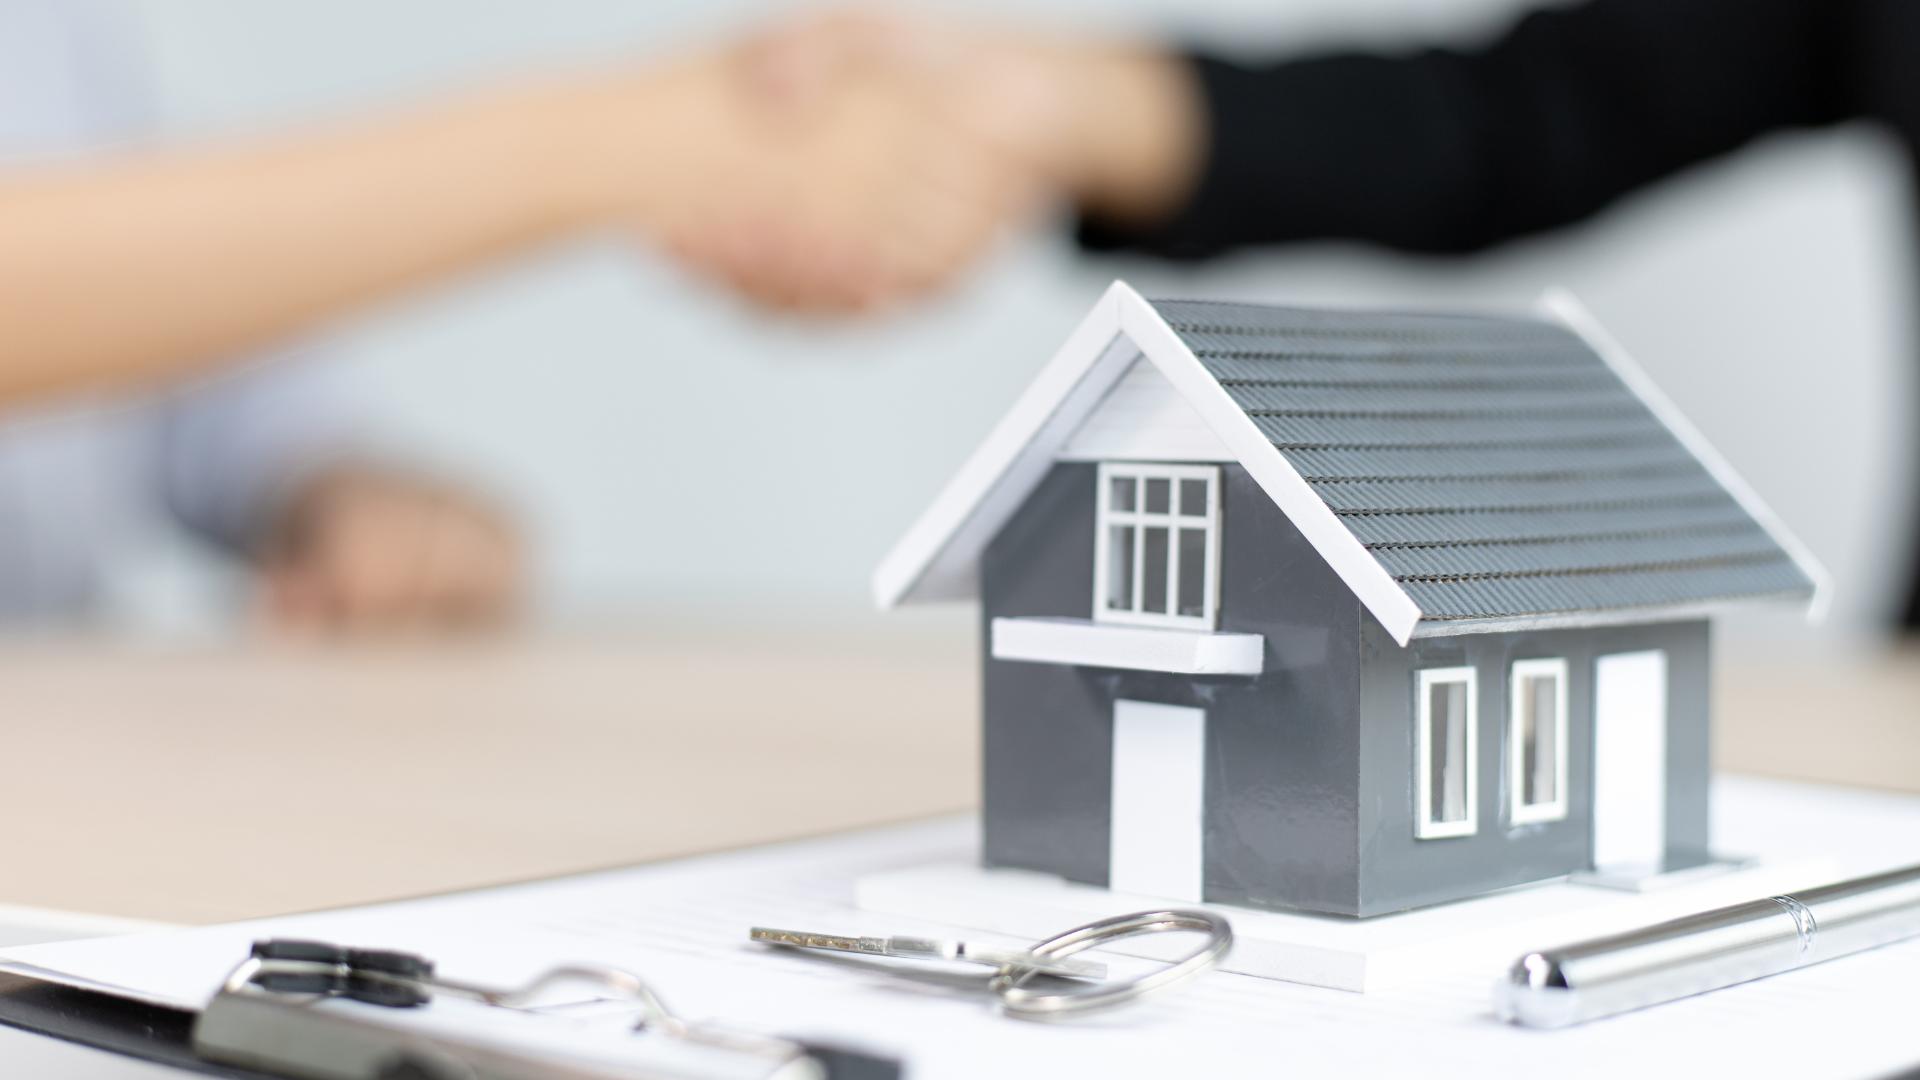 Why We Buy Houses